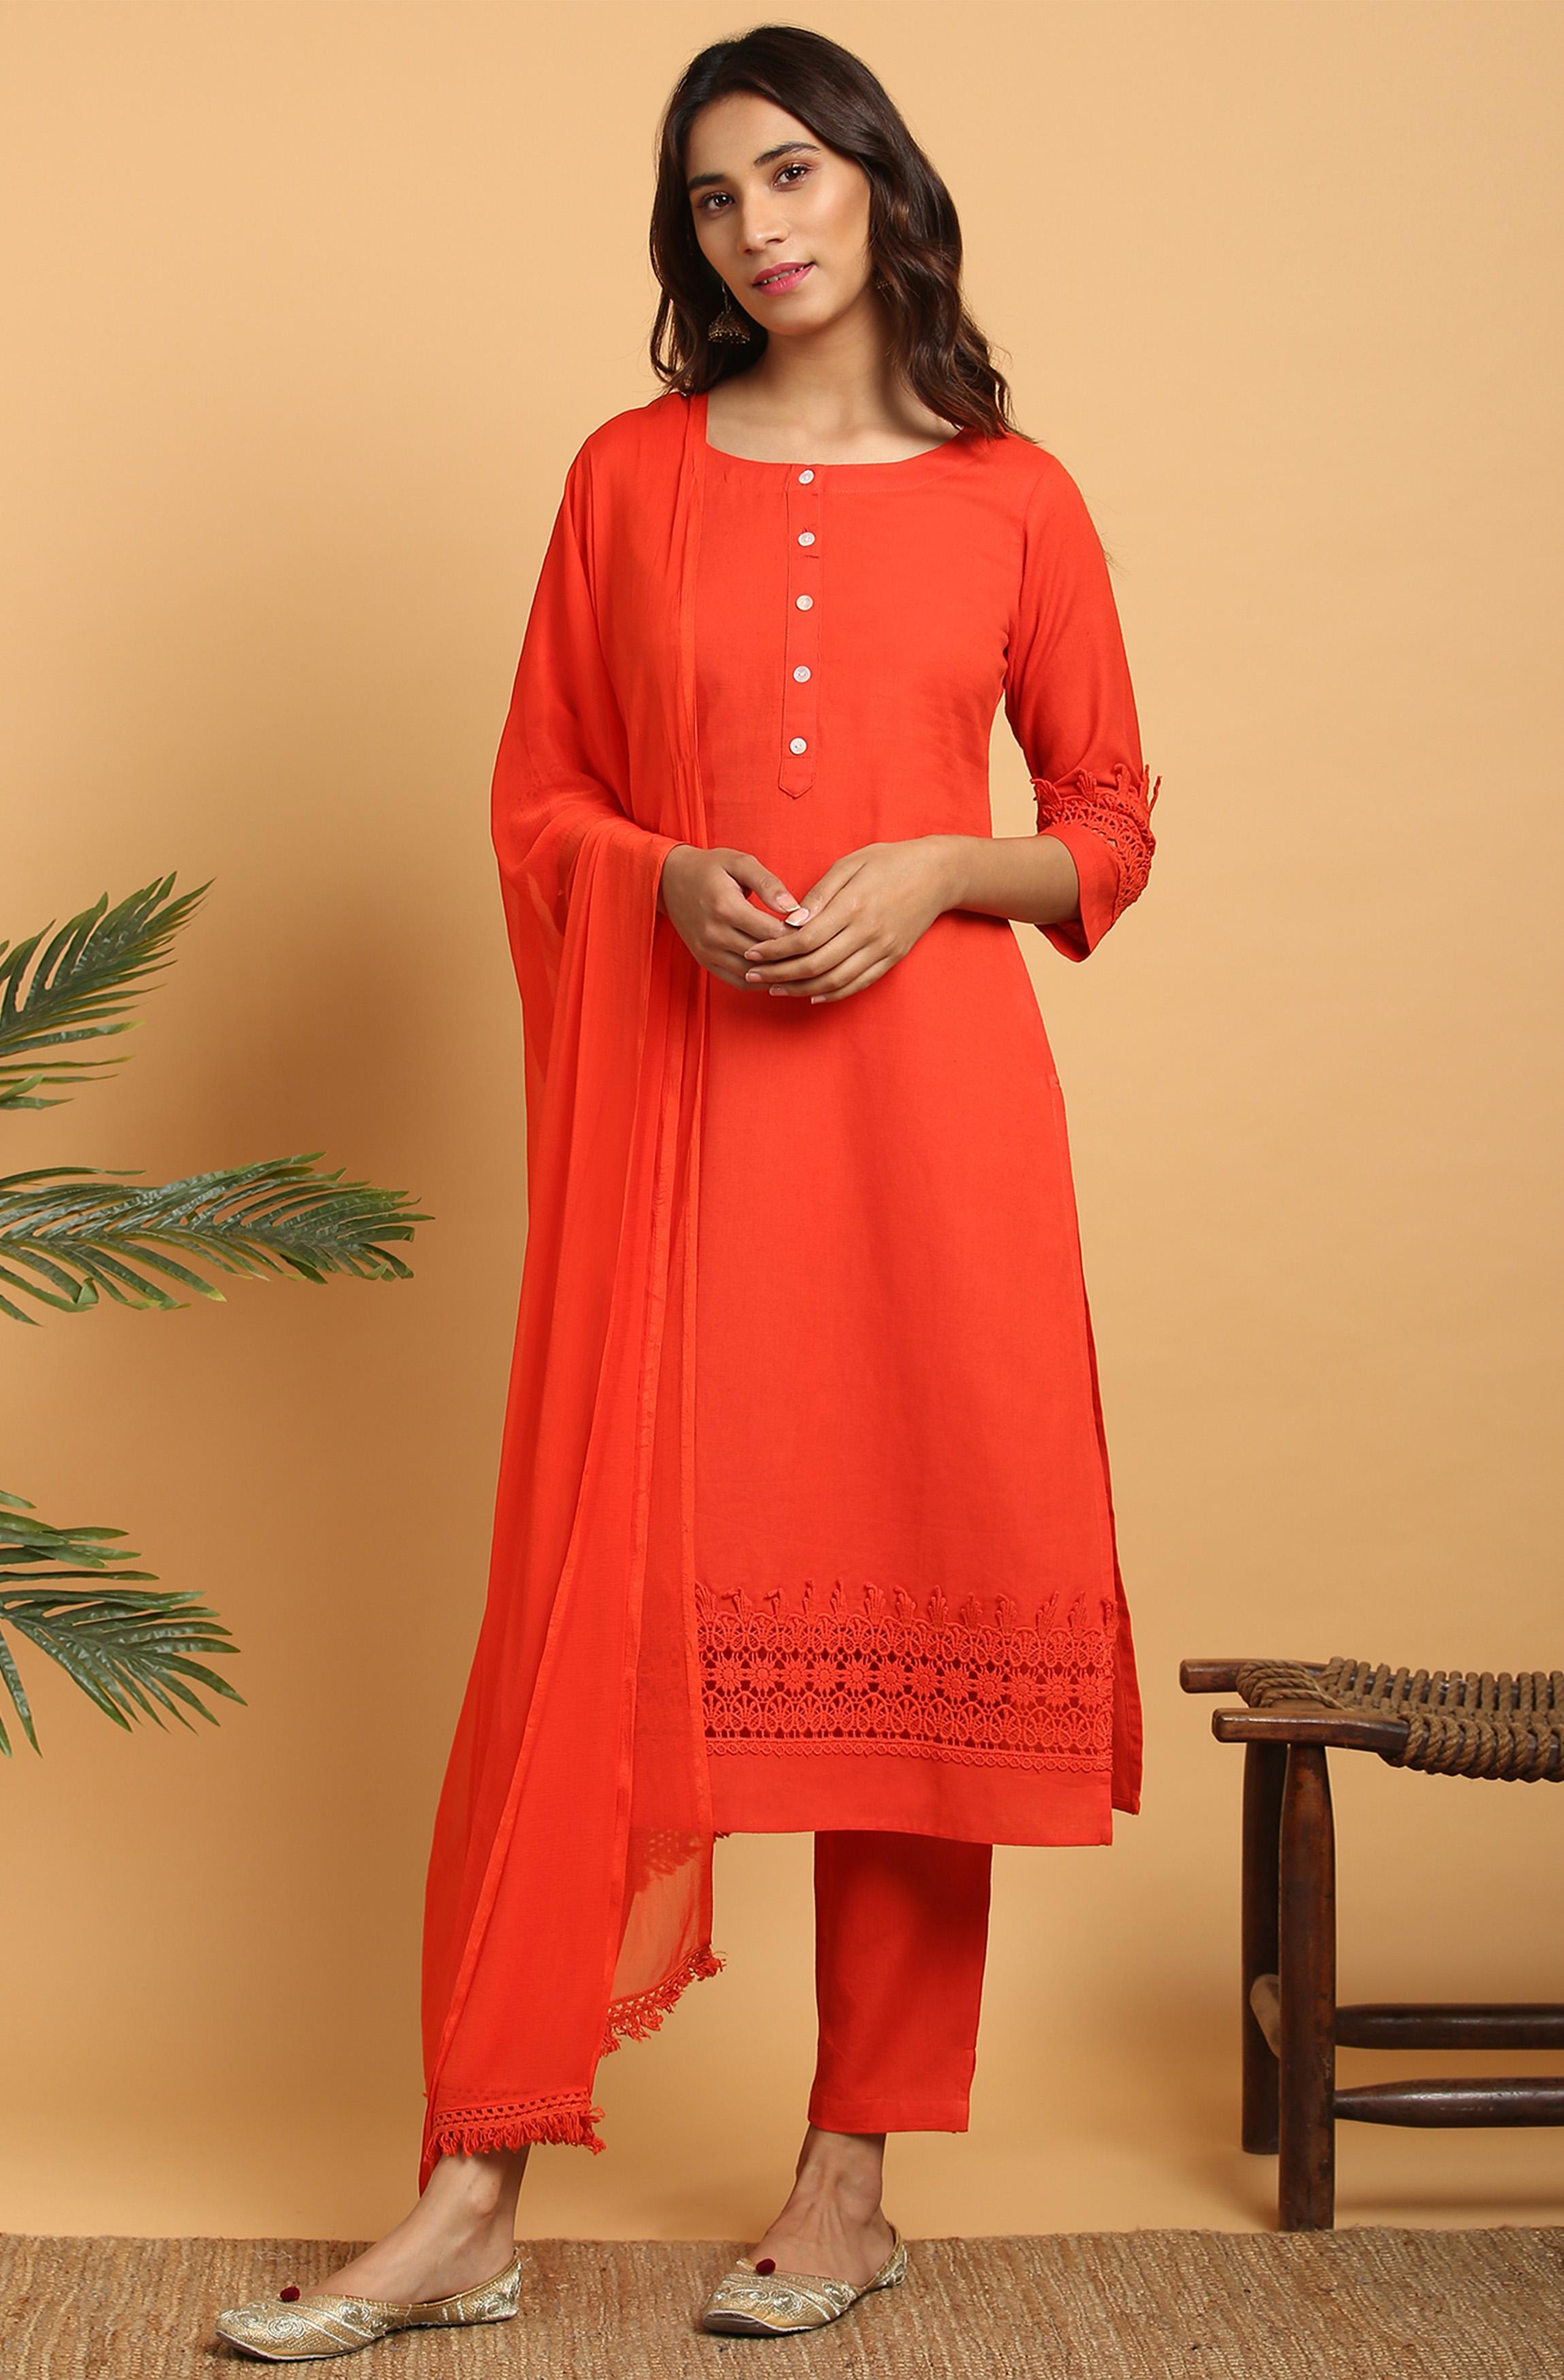 Janasya | Janasya Women's Red Cotton Flex Kurta With Pant and Dupatta